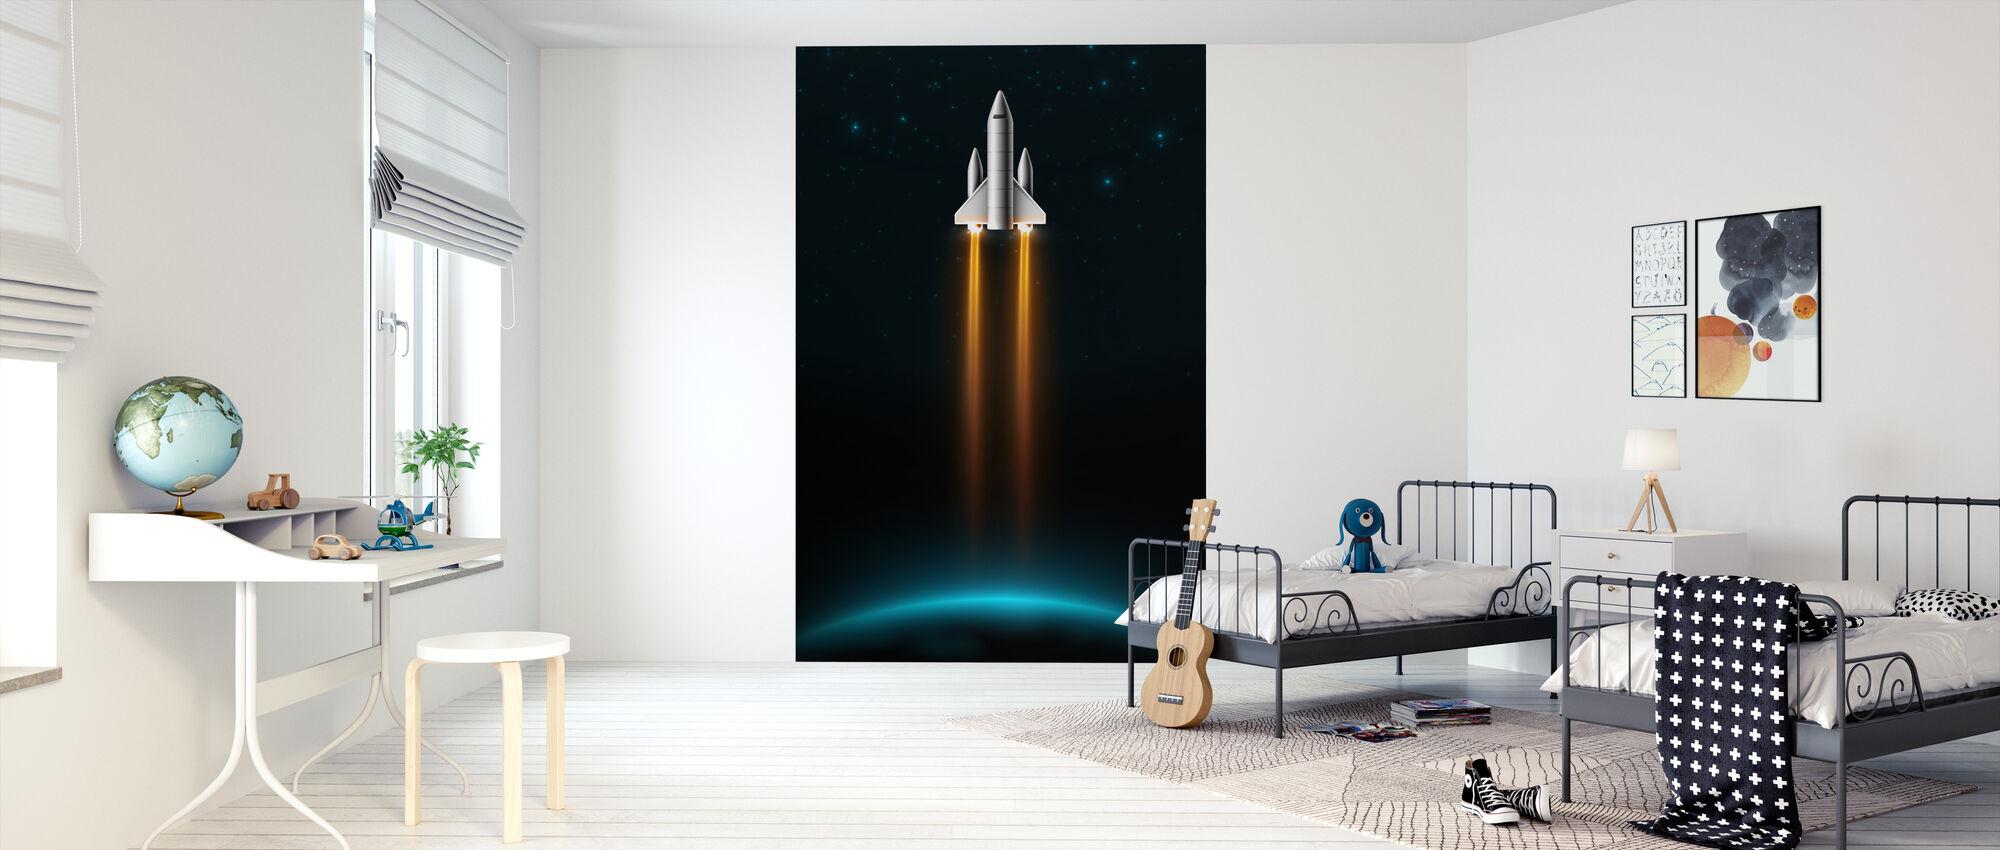 Take Off - Wallpaper - Kids Room